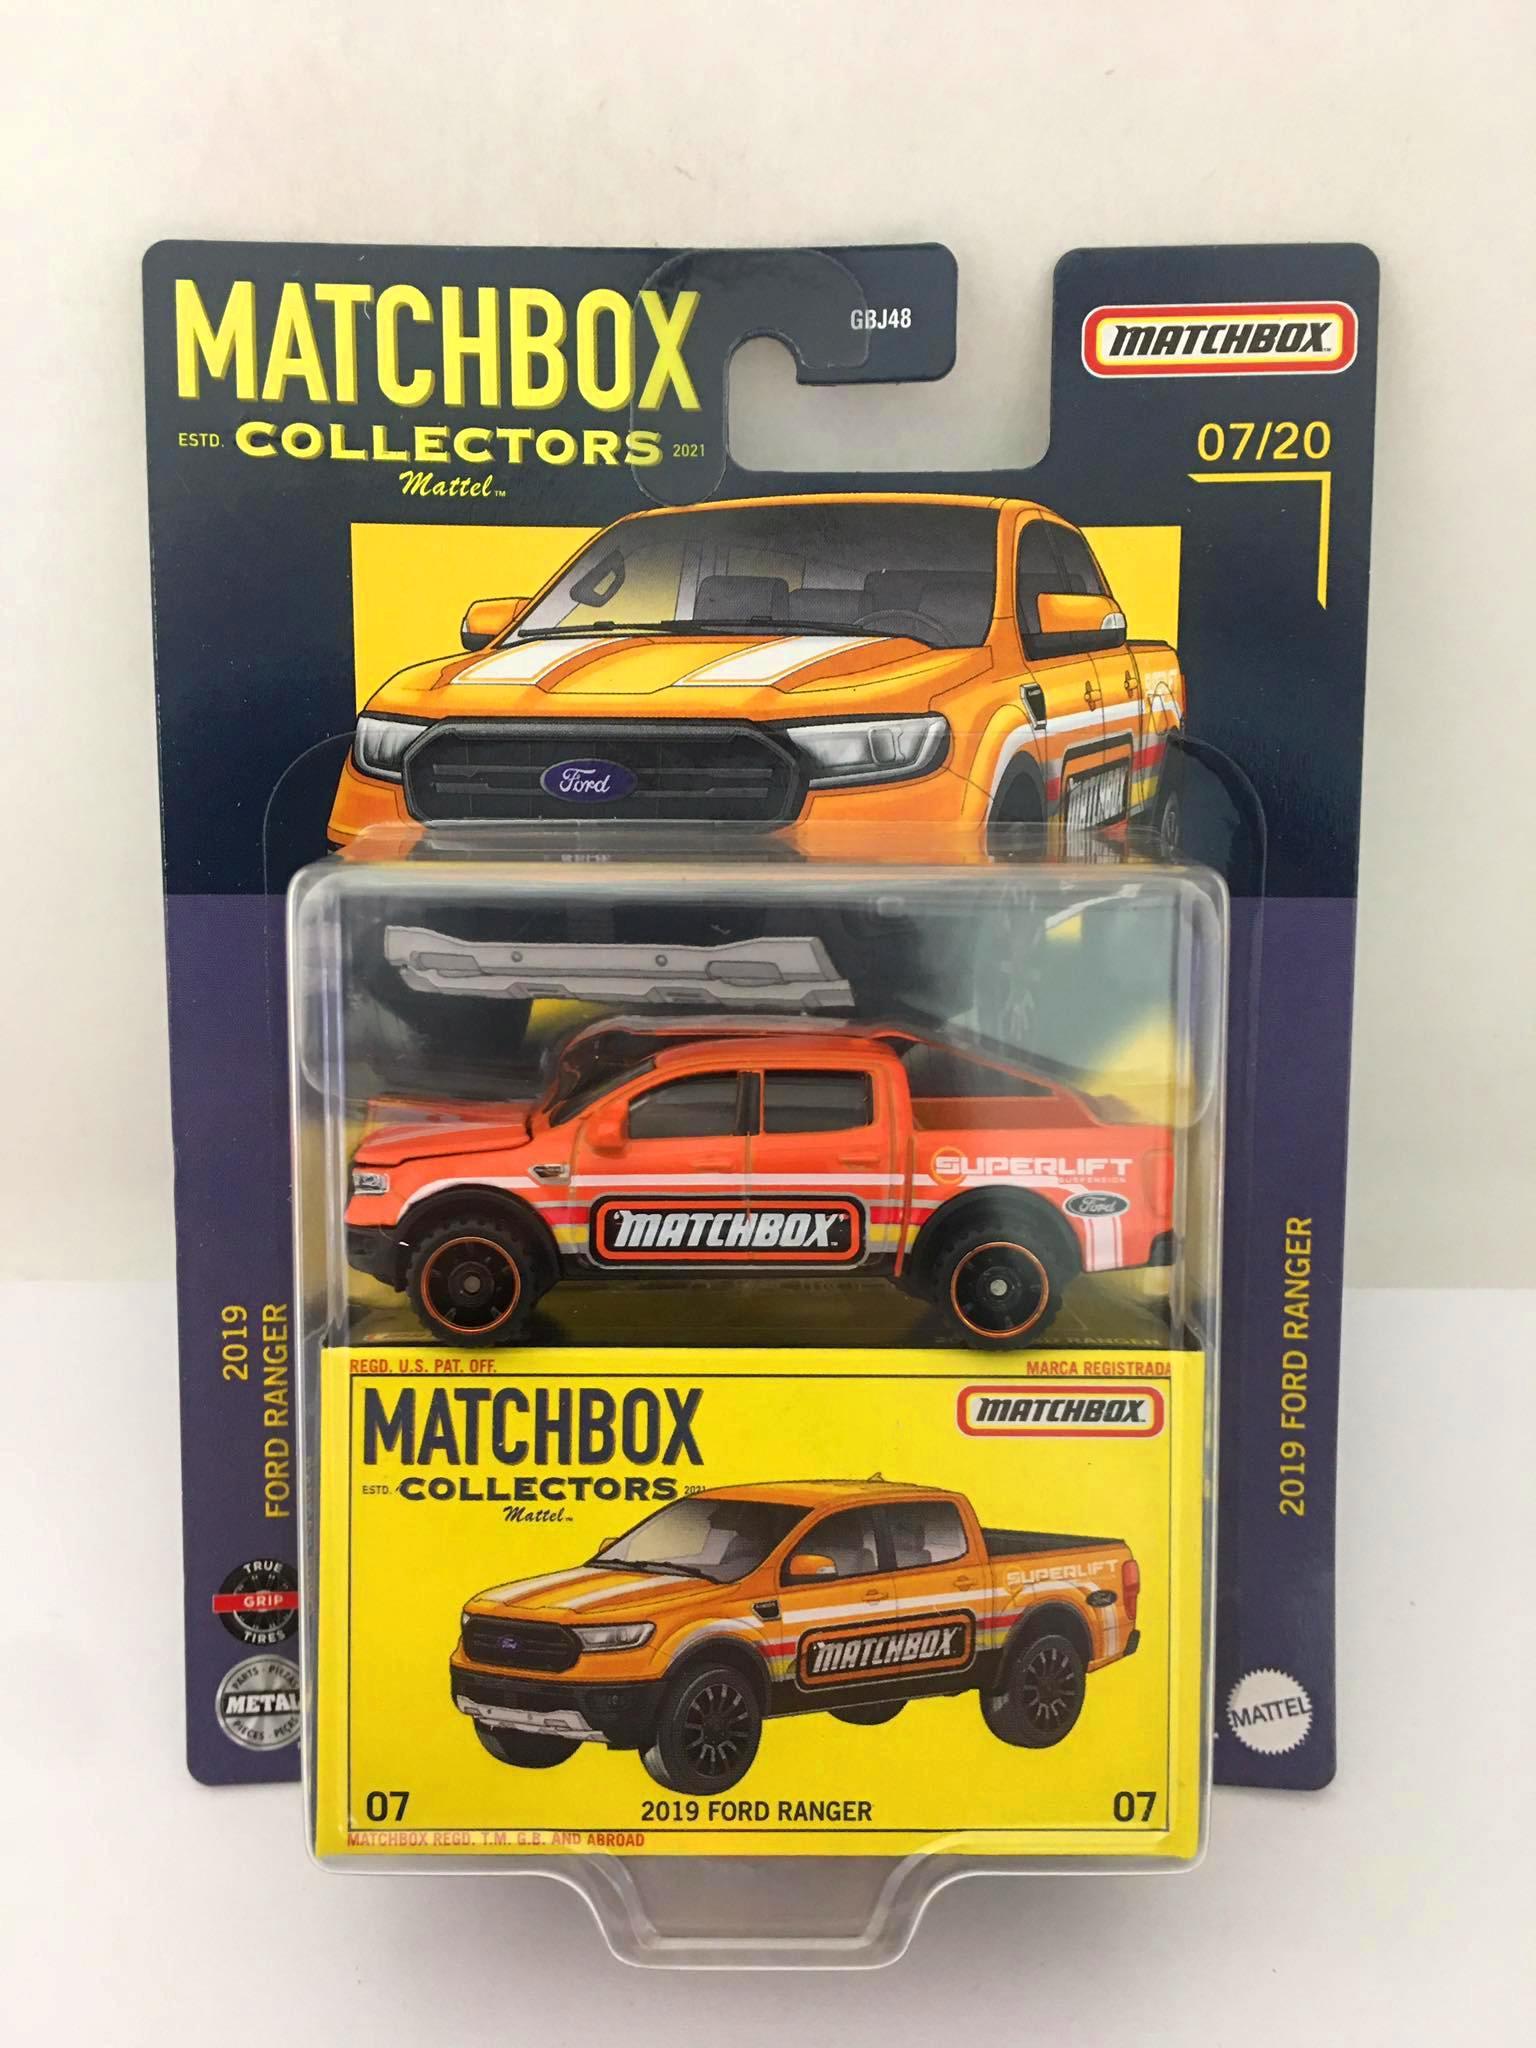 Matchbox - 2019 Ford Ranger Laranja - Matchbox Estd. Collectors 2021